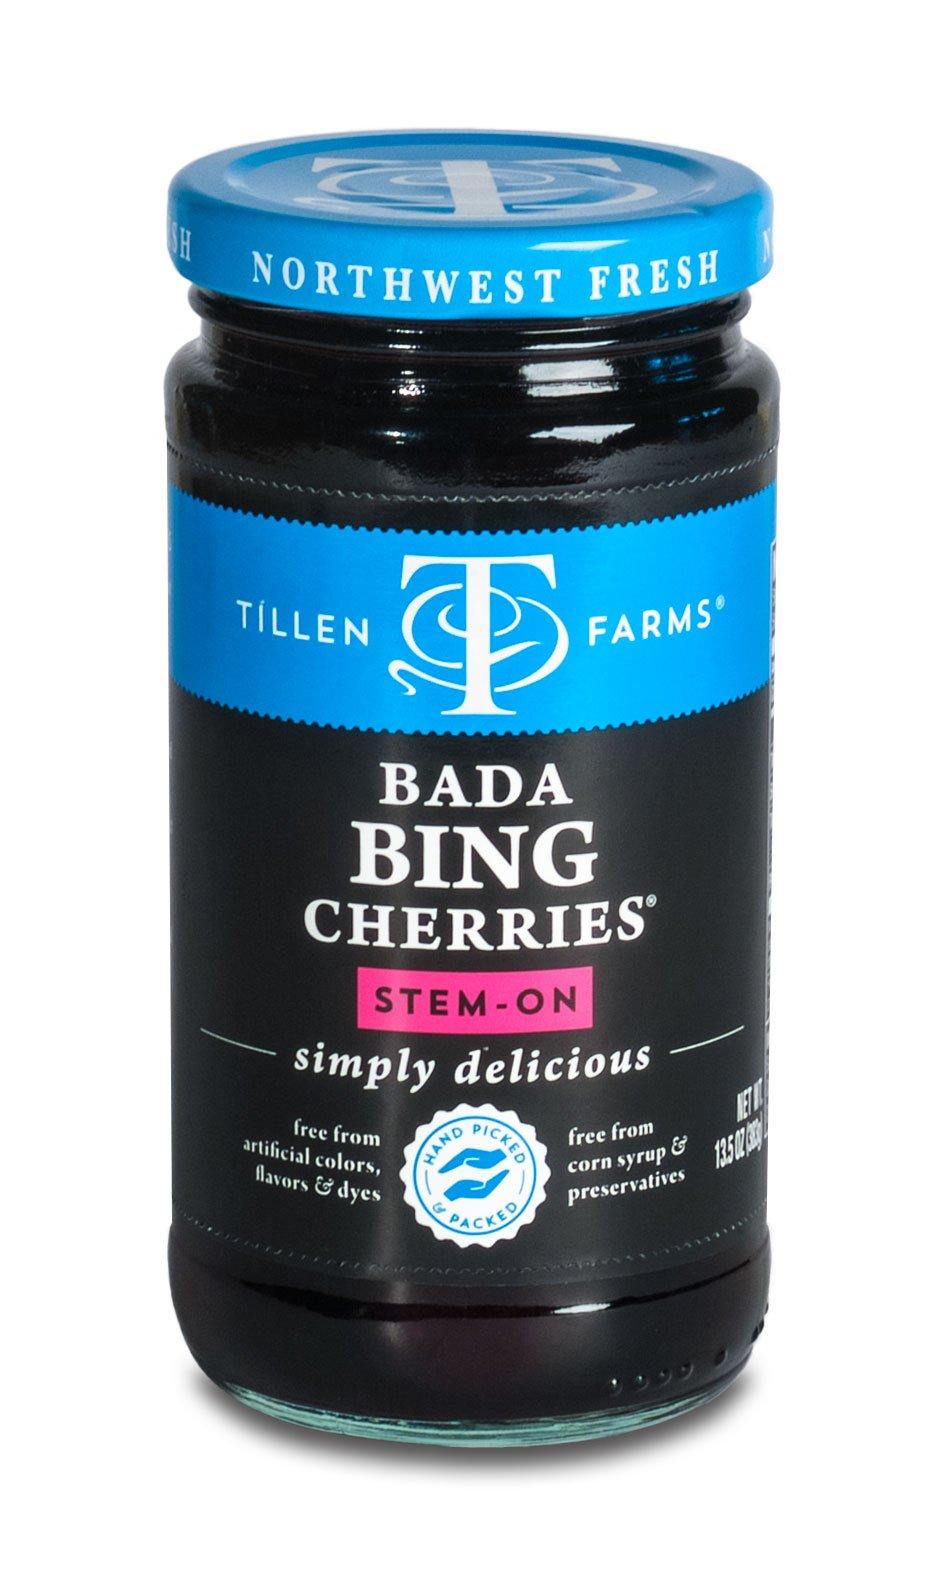 Tillen Farms Cherries, Bada Bings, 13.5 Ounce (Pack of 4)